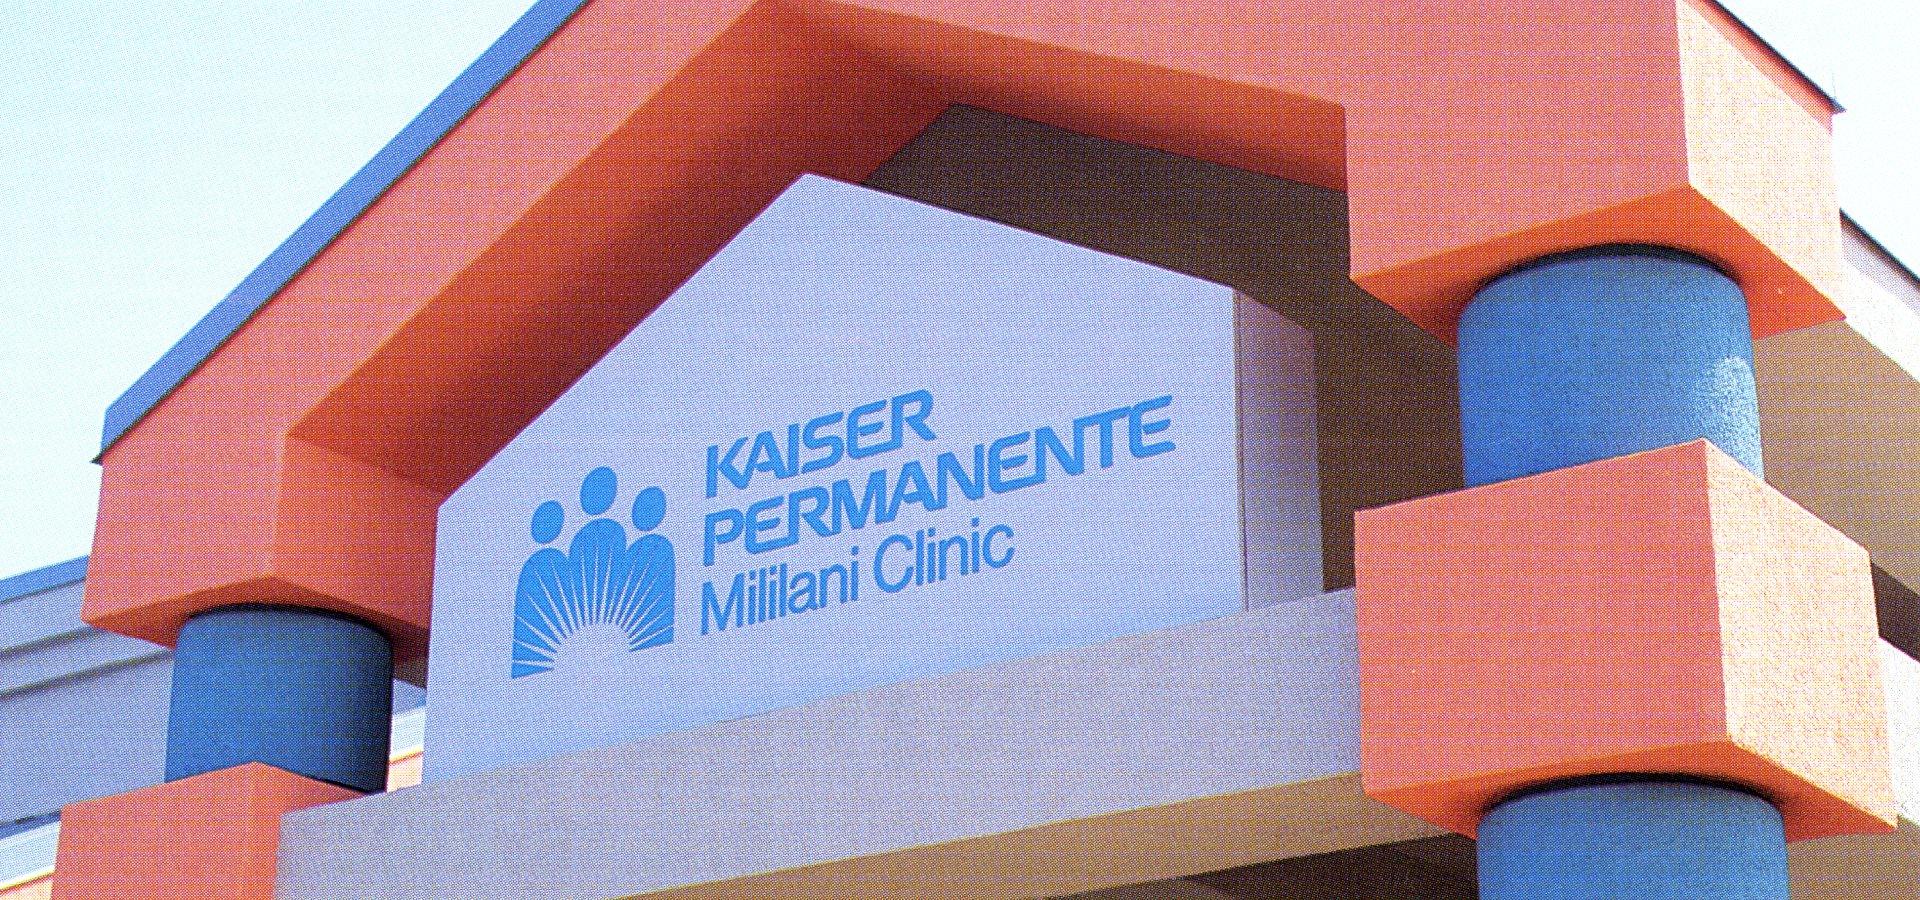 Kaiser Permanente Mililani Clinic